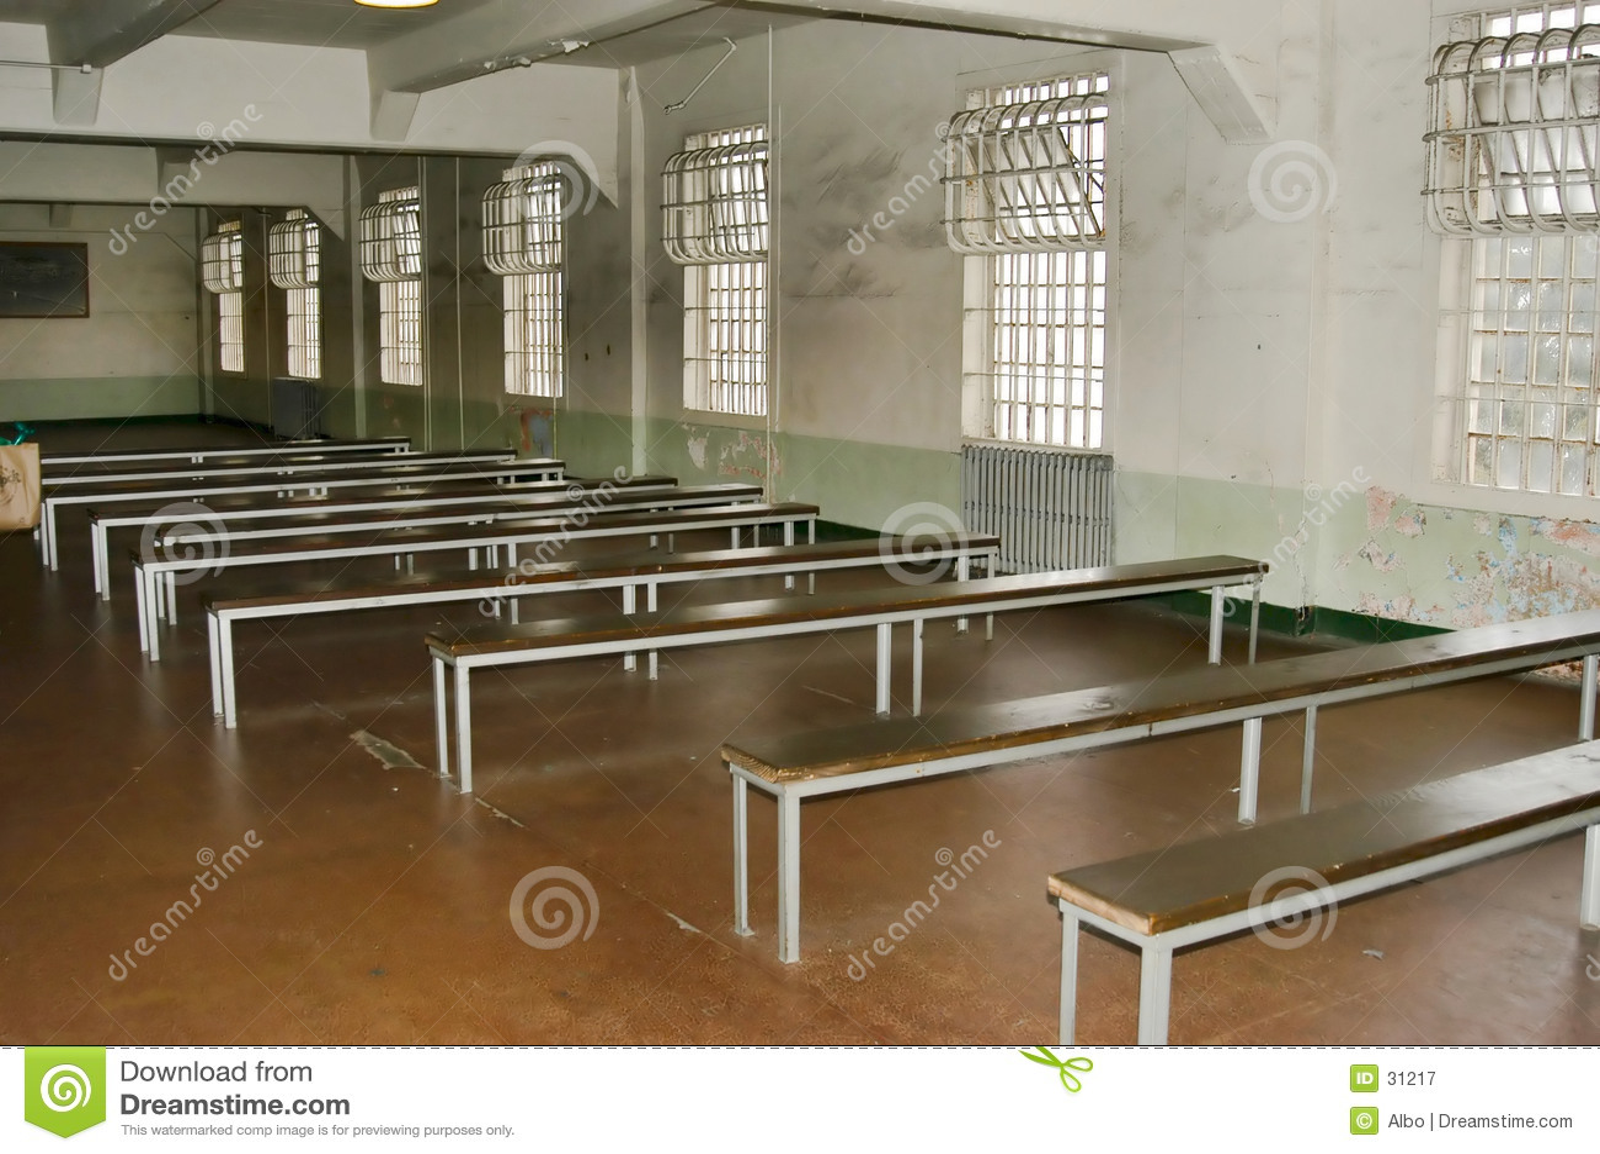 Alcatrazarrest